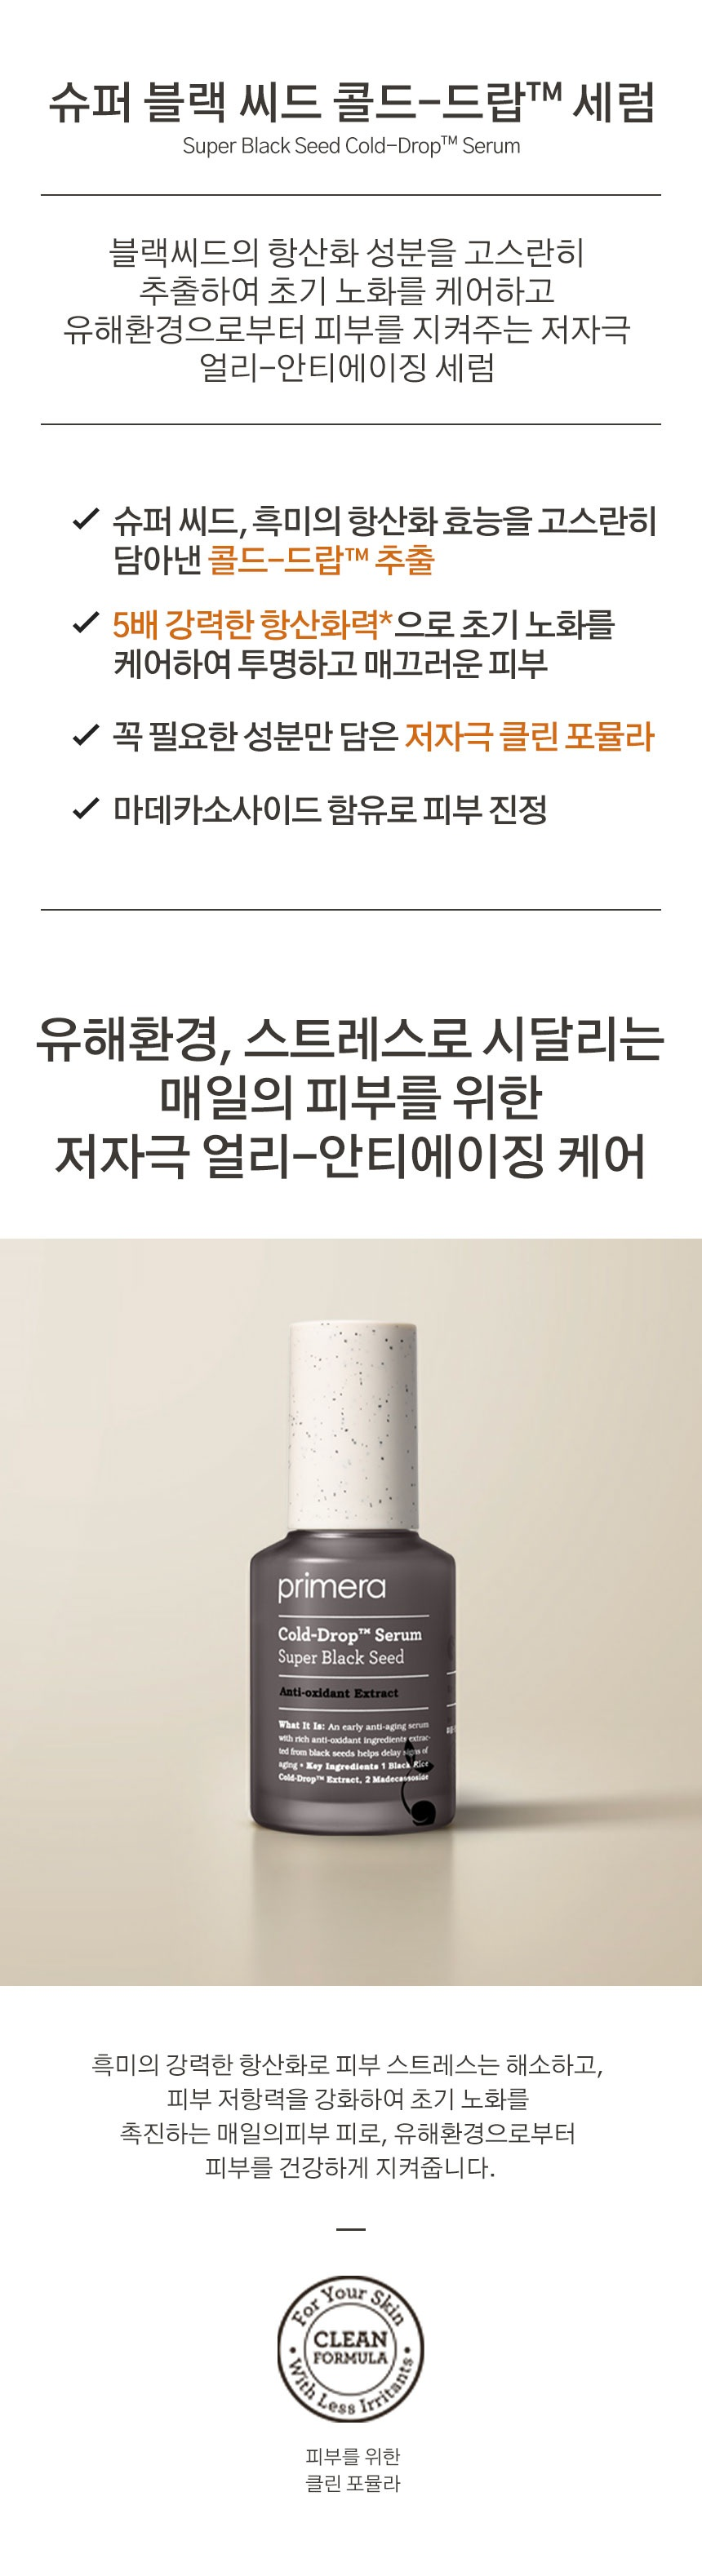 primera Super Black Seed Cold Drop Serum korean skincare product online shop malaysia macau poland1